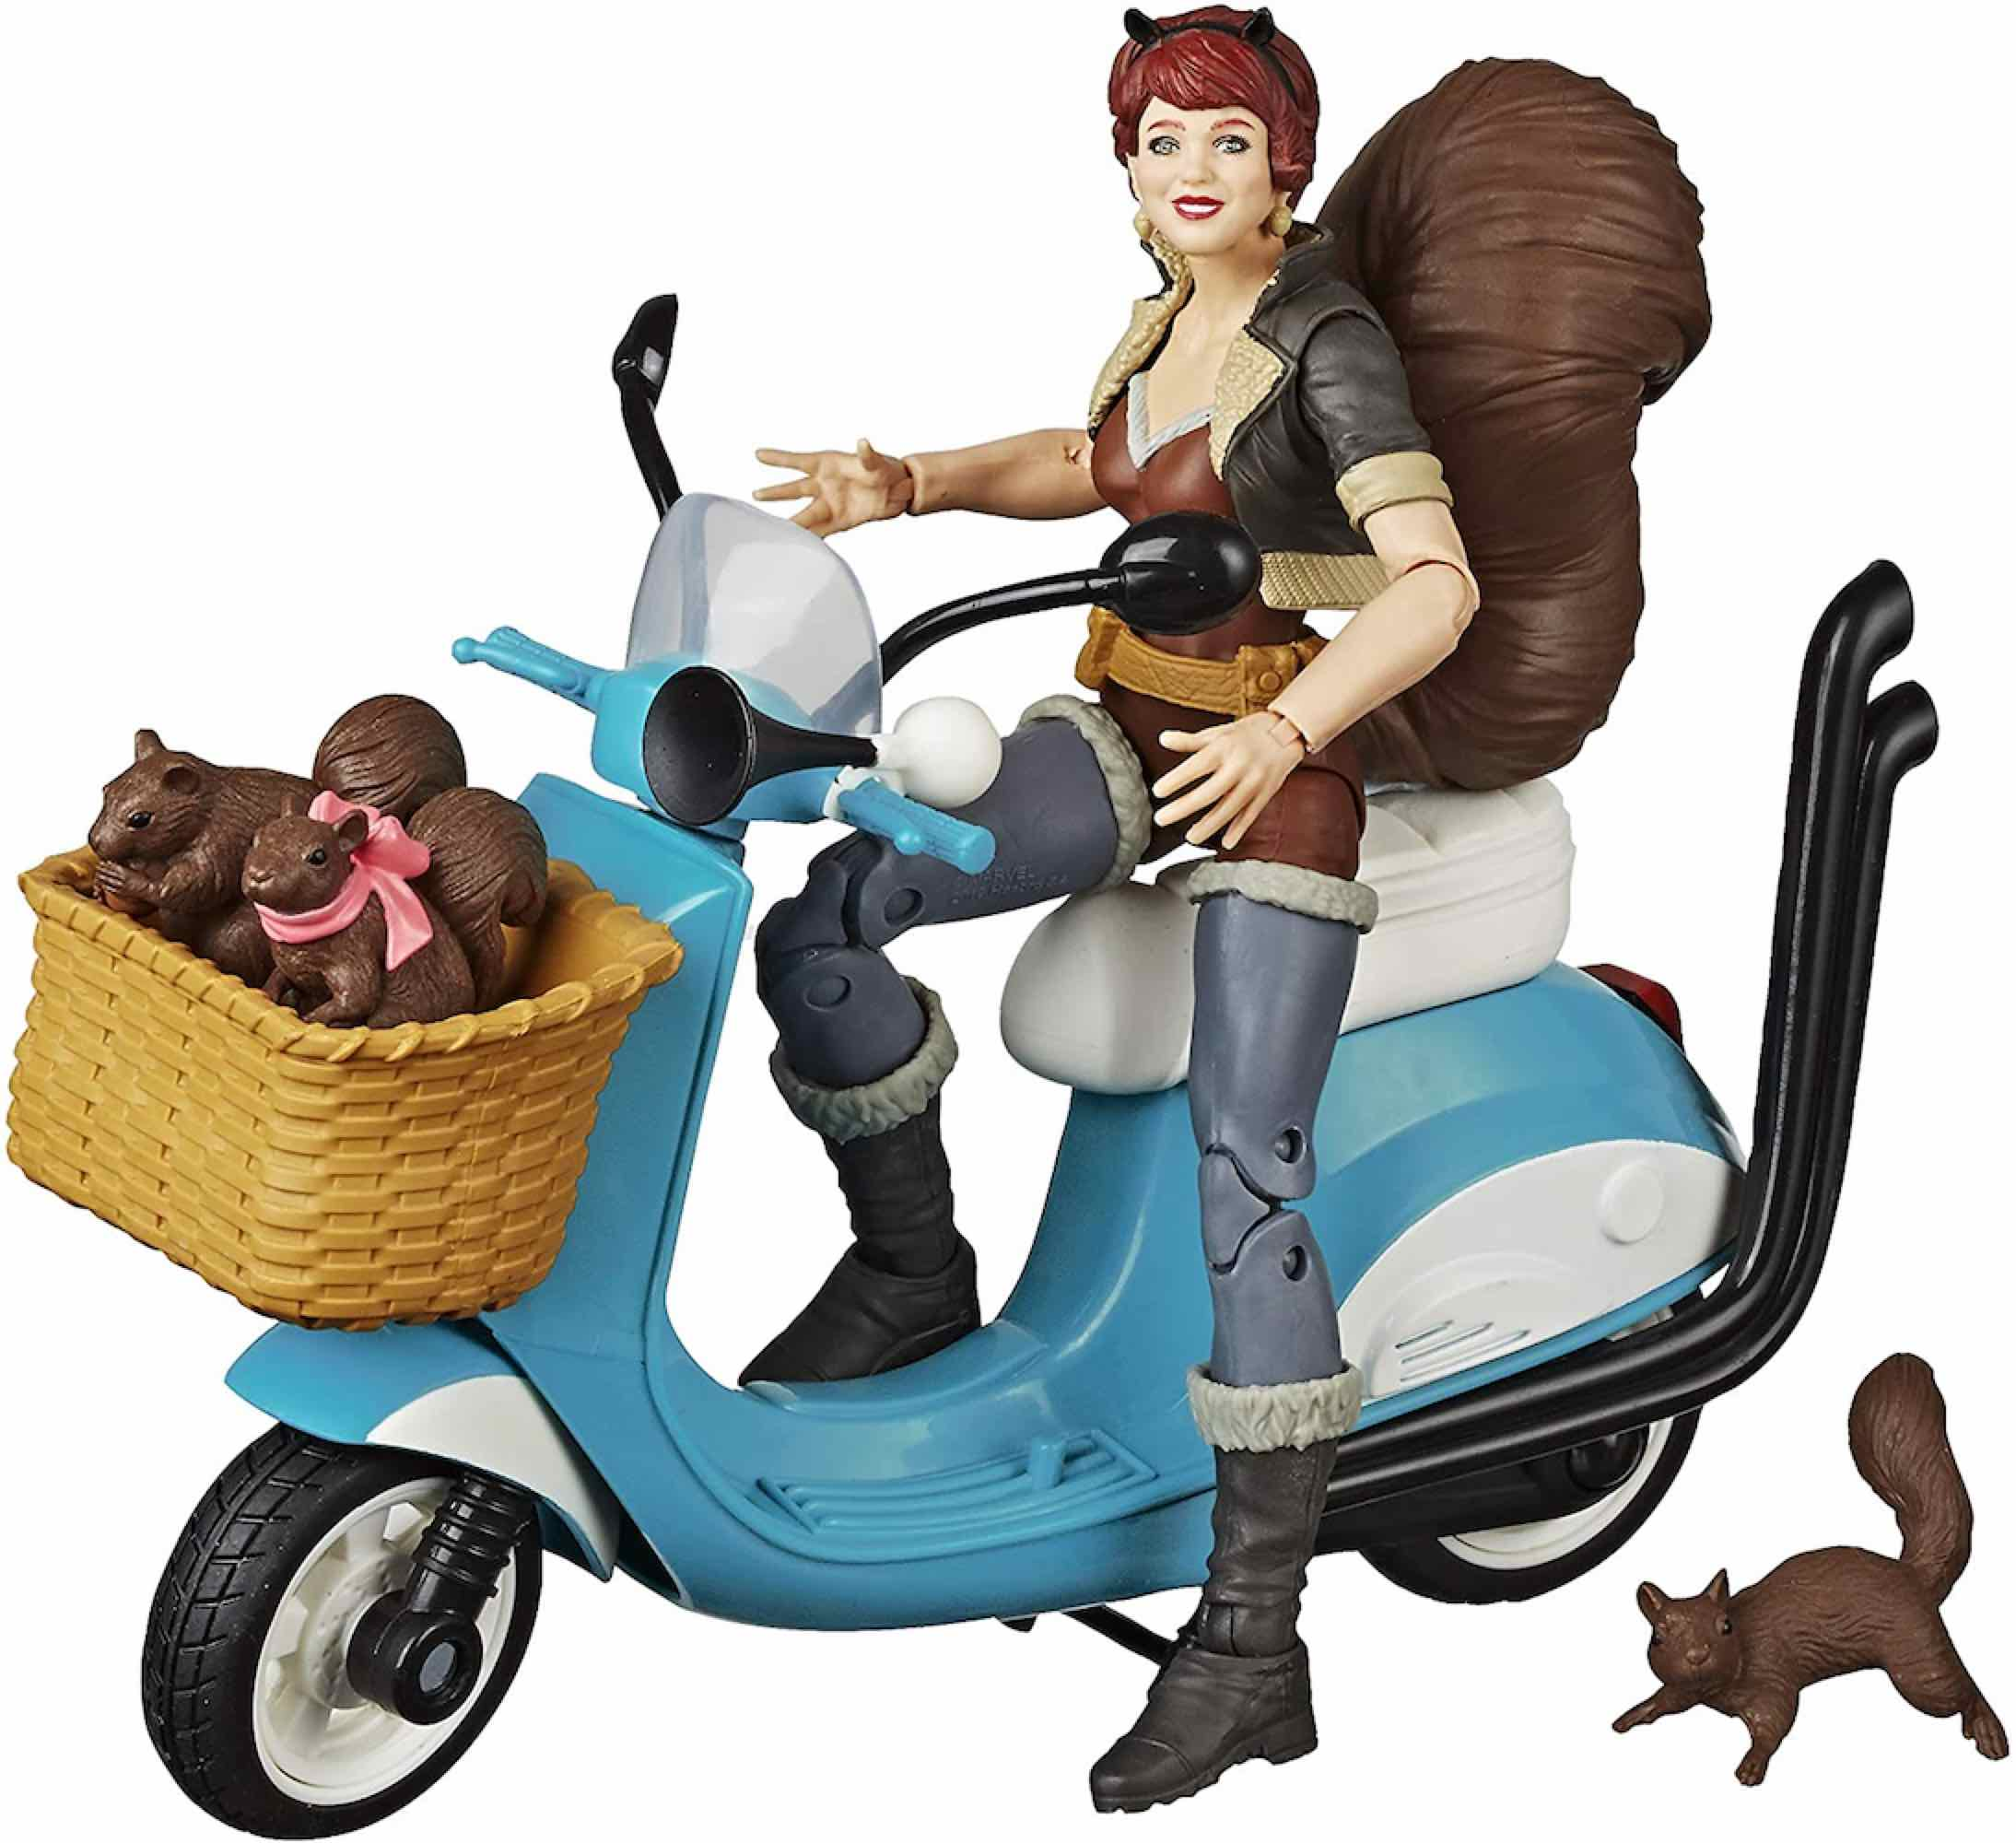 SQUIRREL GIRL + MOTOCICLETA FIGURA 15 CM MARVEL LEGENDS VEHICLE E86005X0